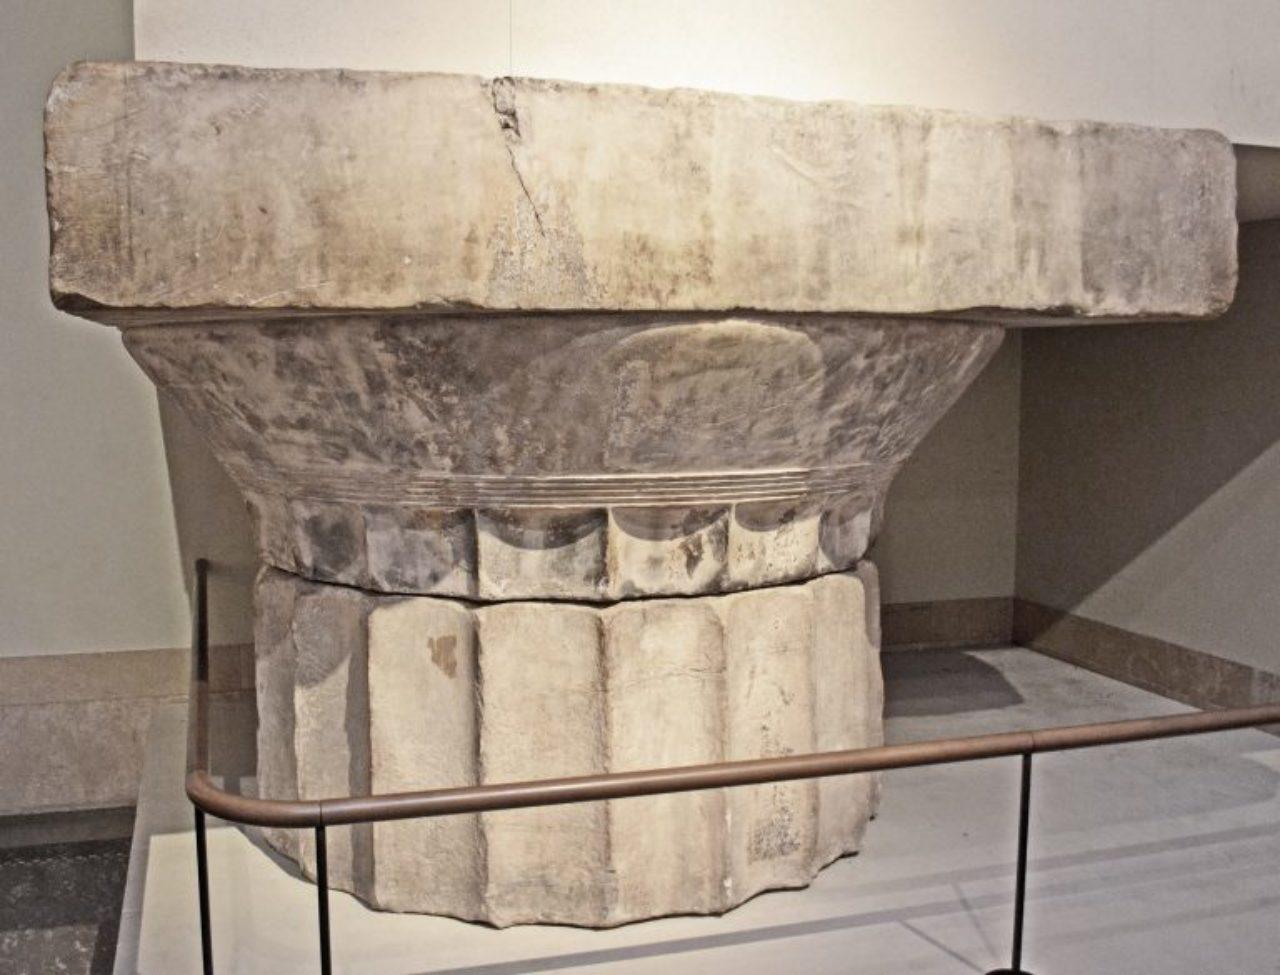 Figure 4: Parthenon capital detail